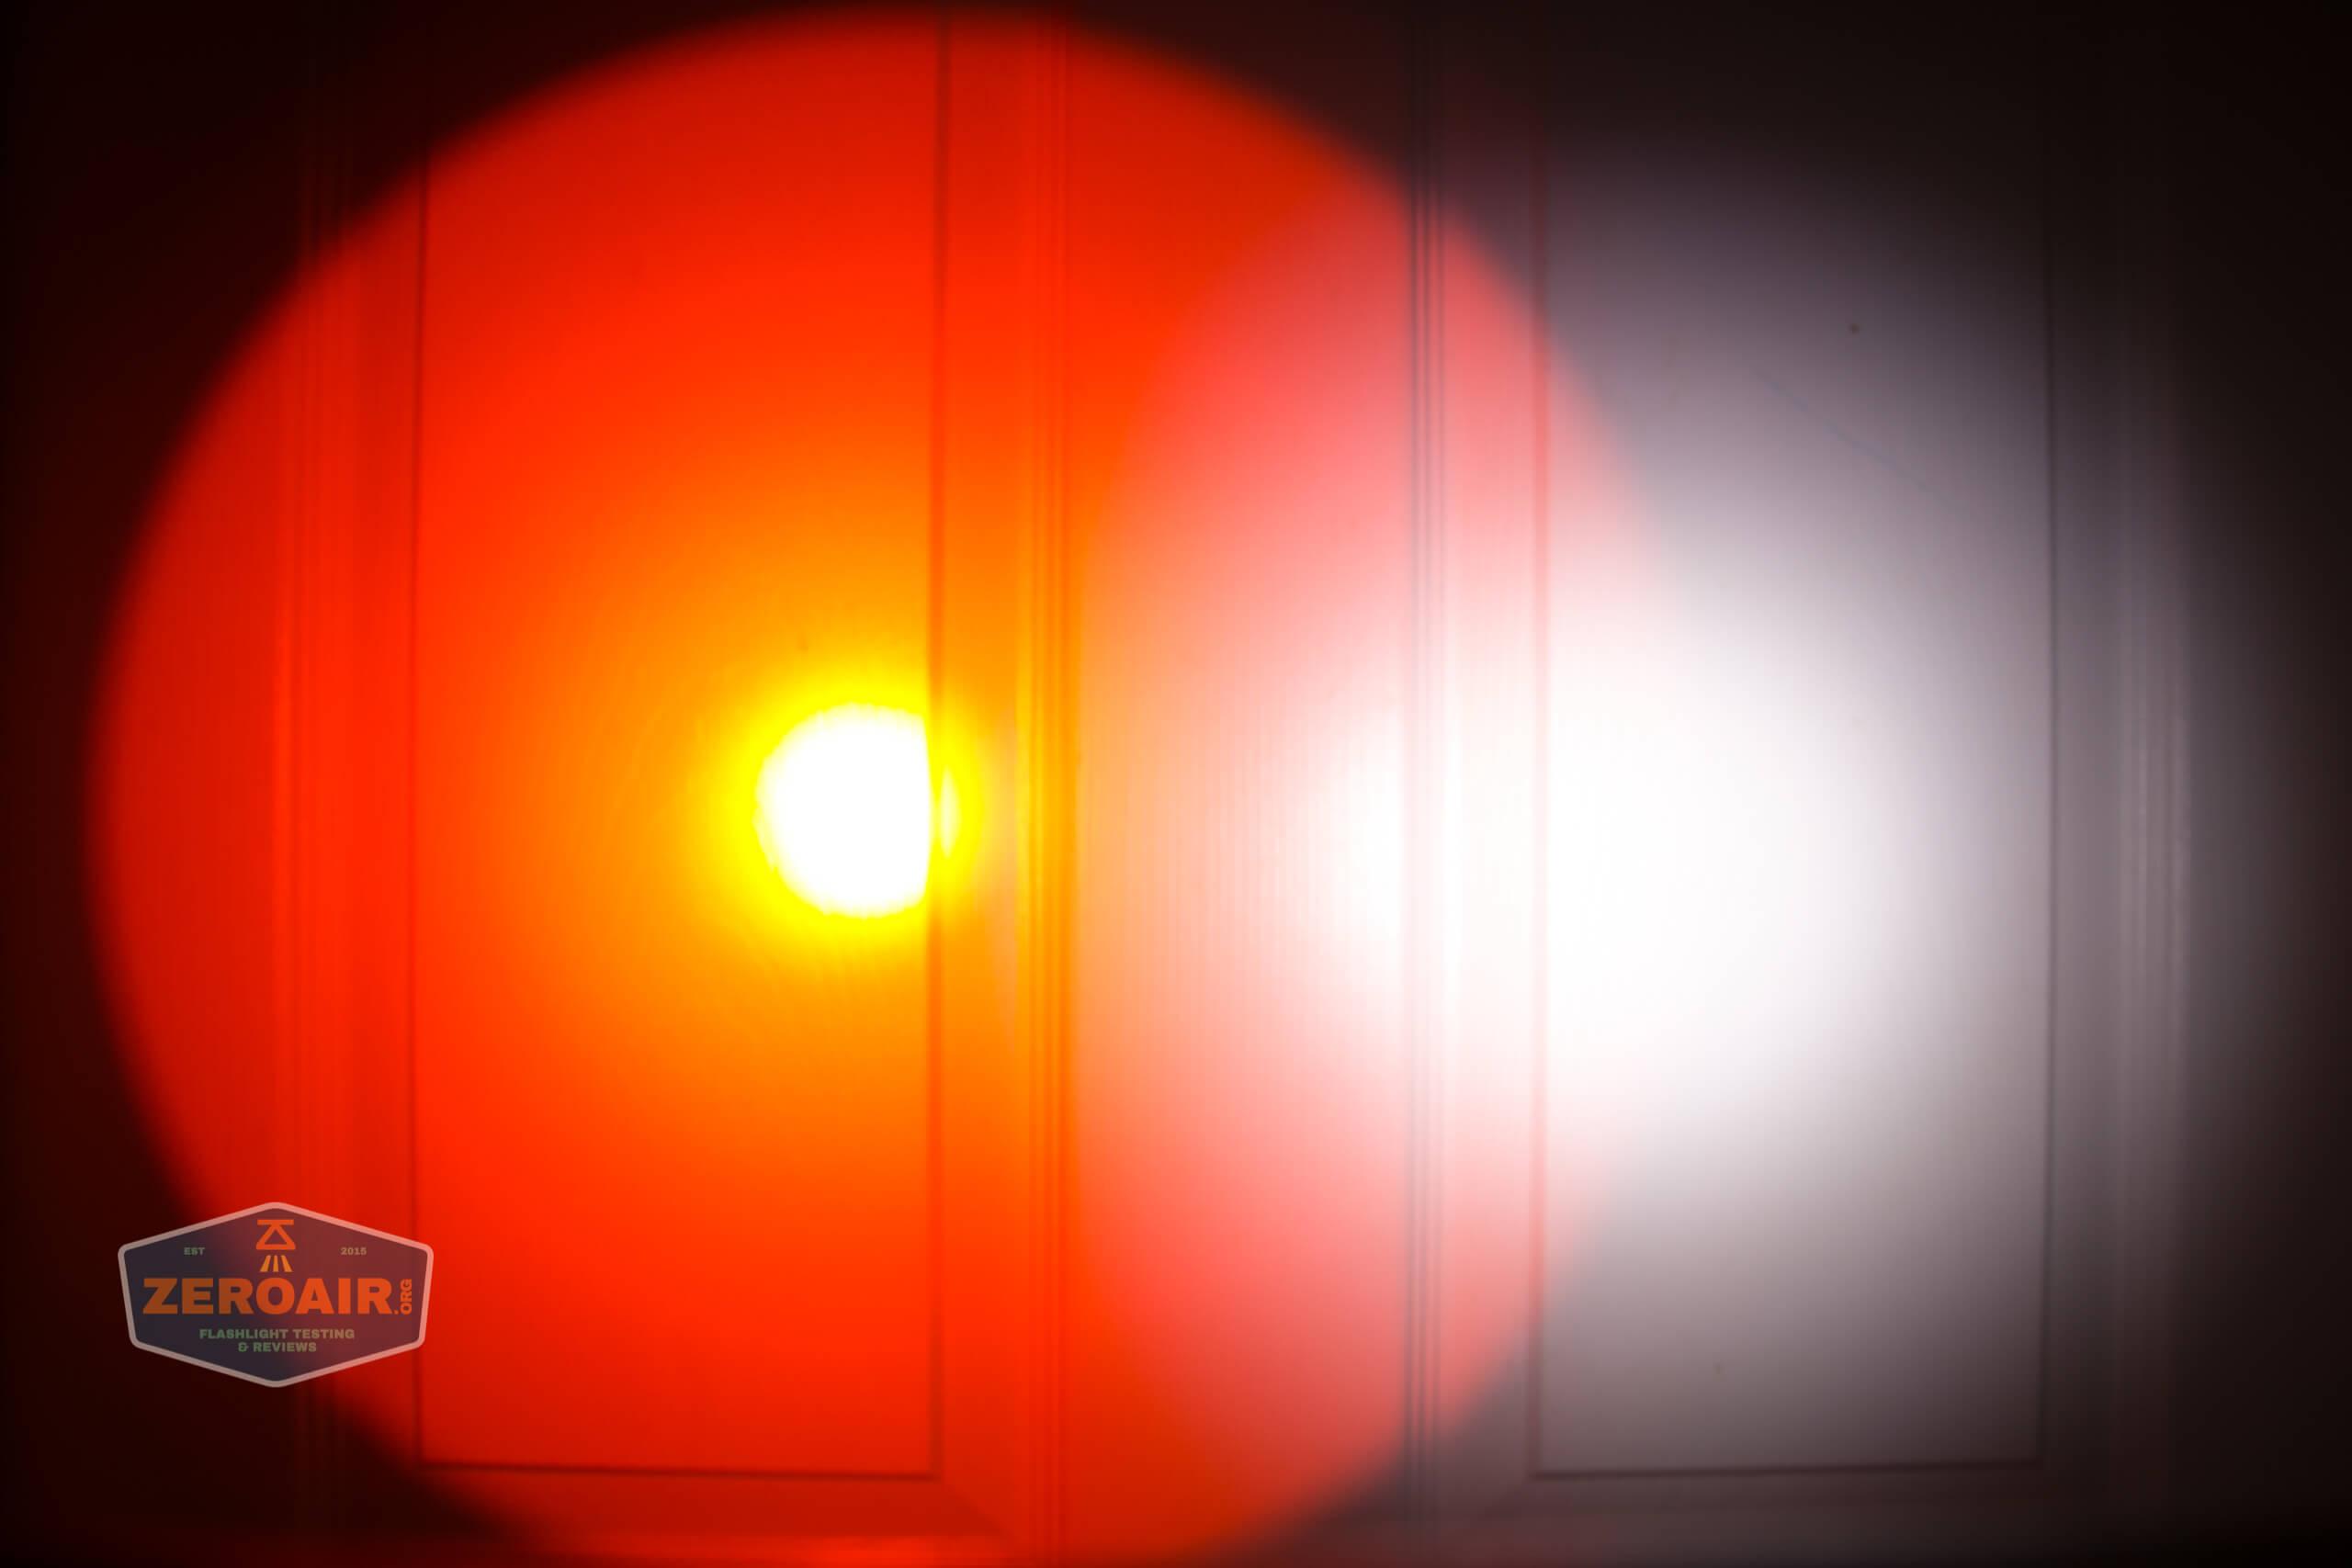 cyansky h5 red beamshot door 3